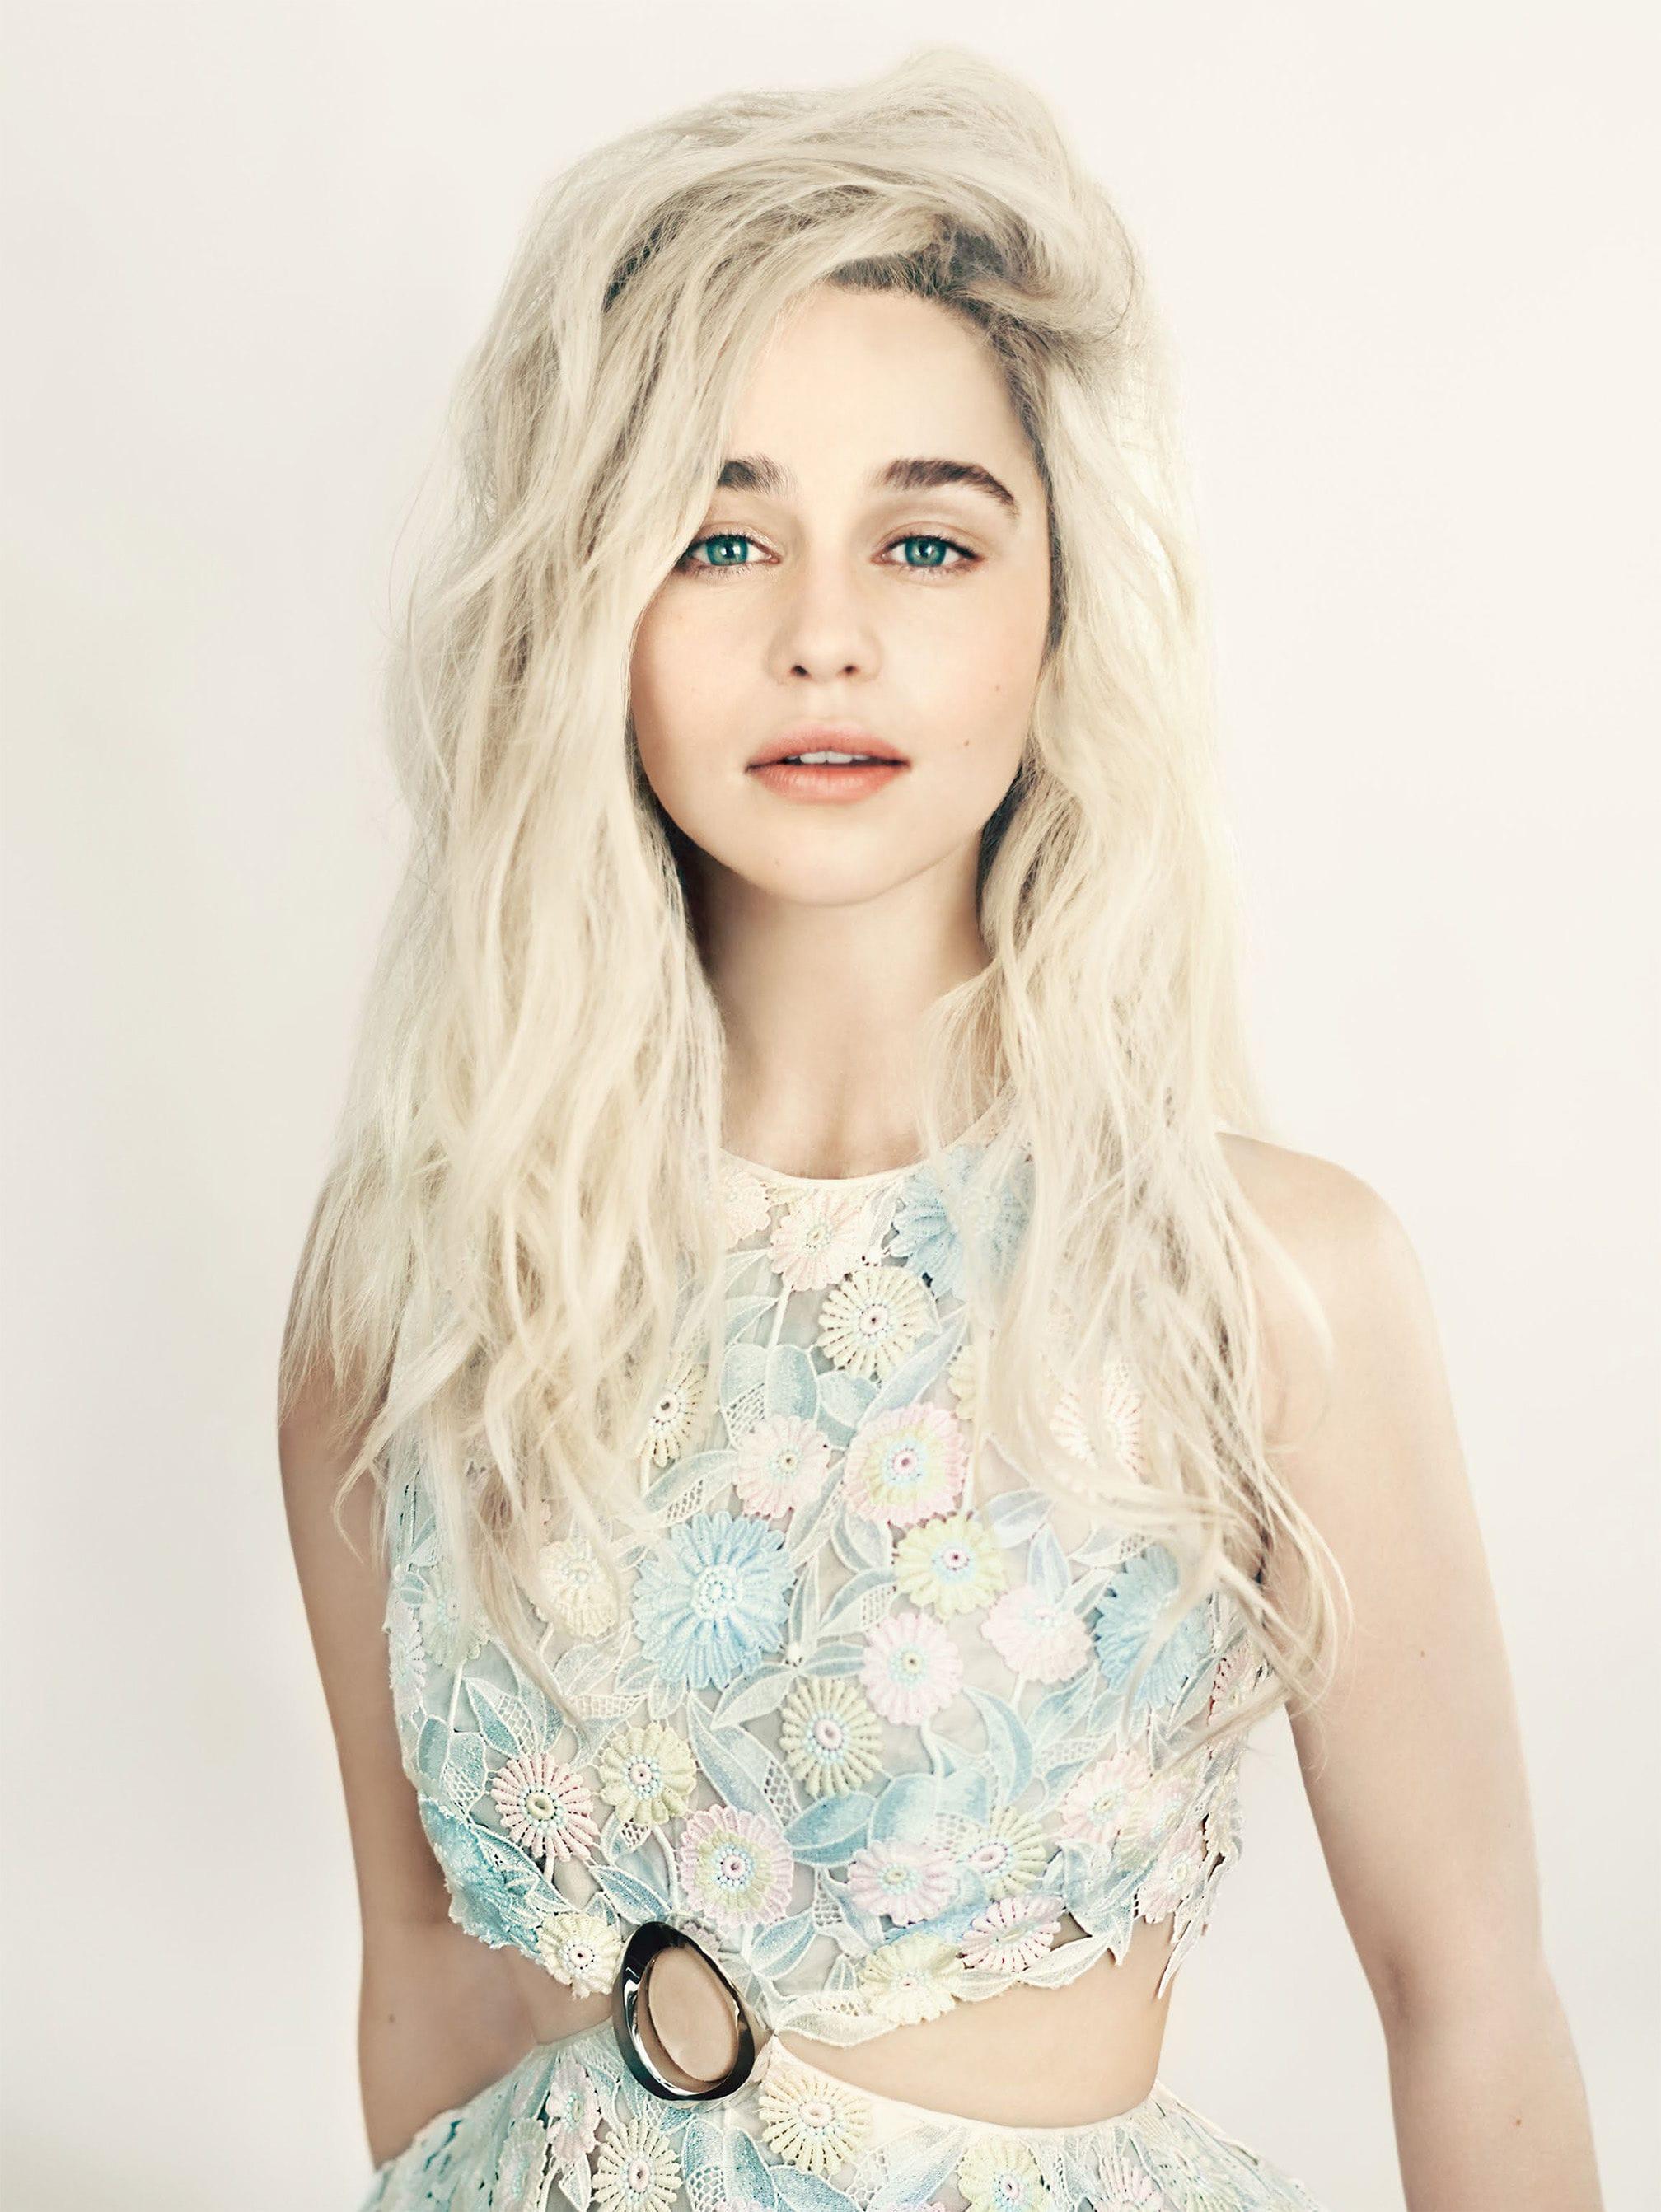 Emilia Clarke HQ wallpapers